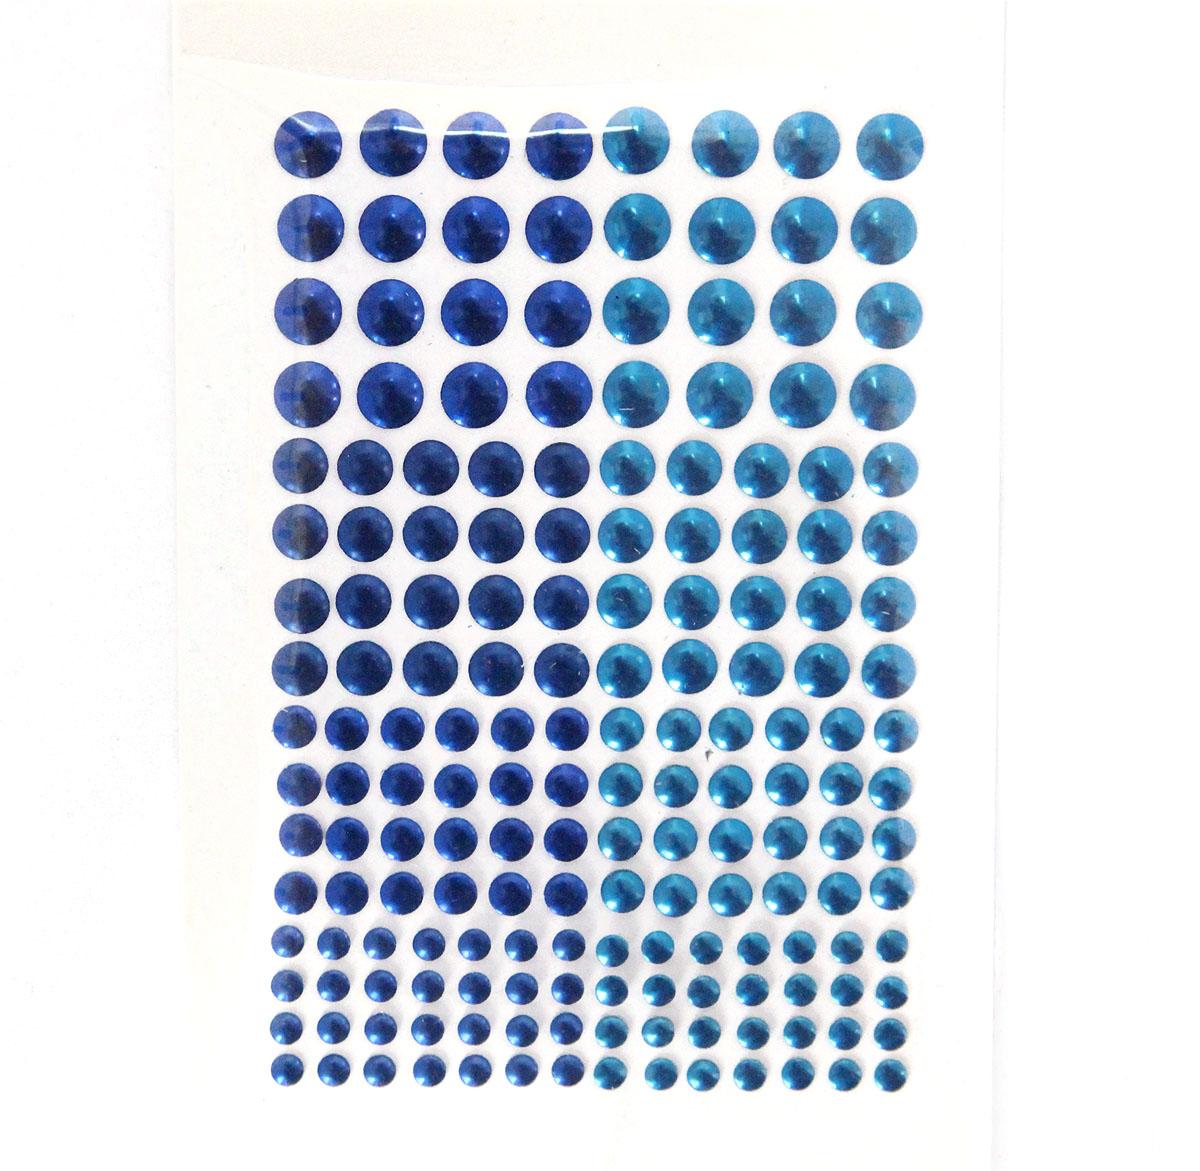 KS-C-METAL Термоклеевые стразы металлик круглые 3/4/5/6мм, 114шт Ki Sign